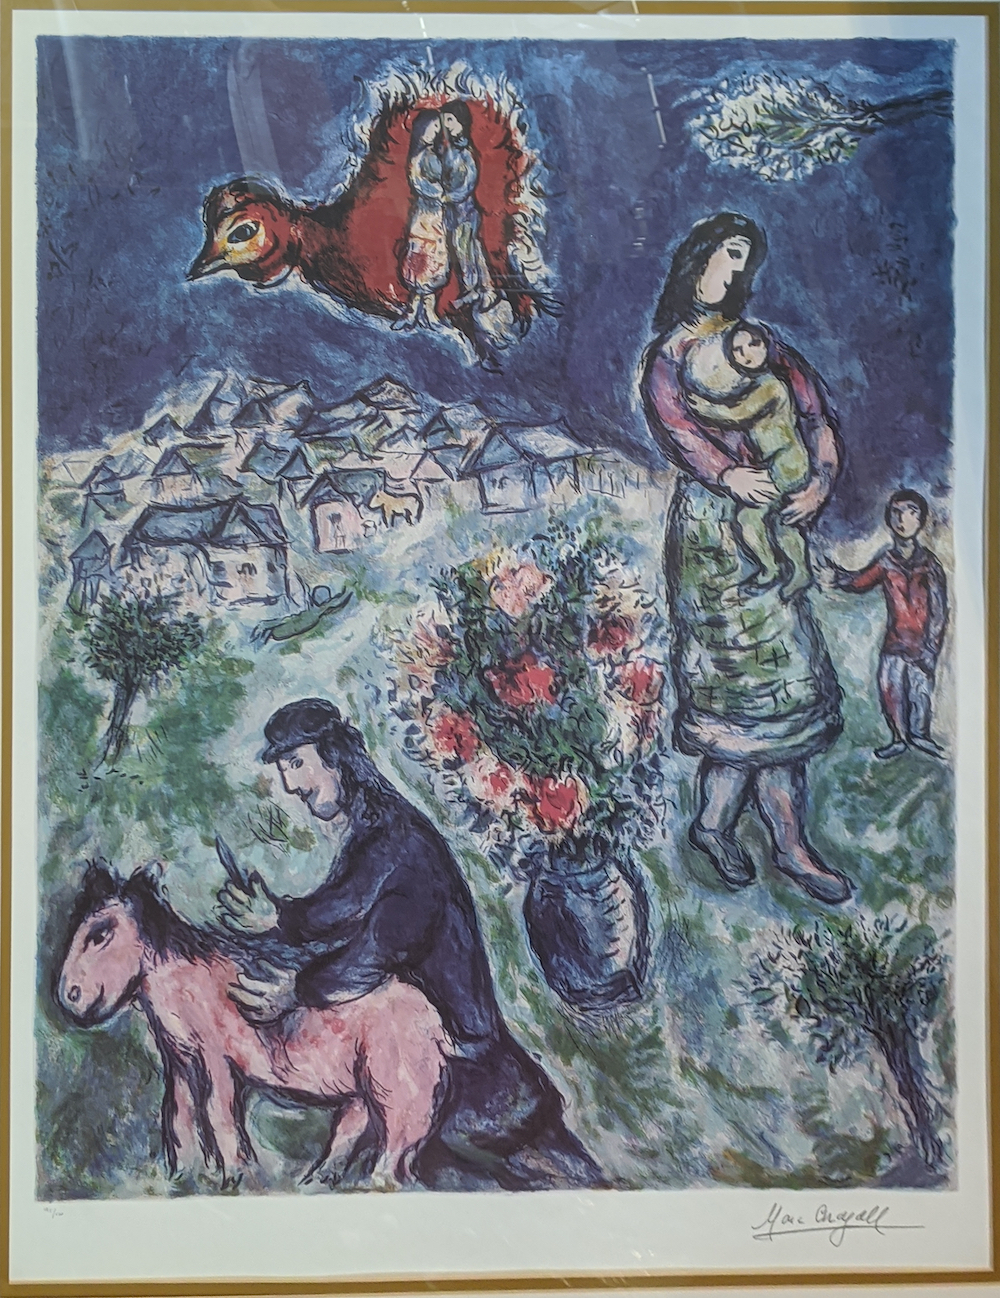 After Marc Chagall (1887-1985), Sur La Route Du Village, lithographic print, signature within print,